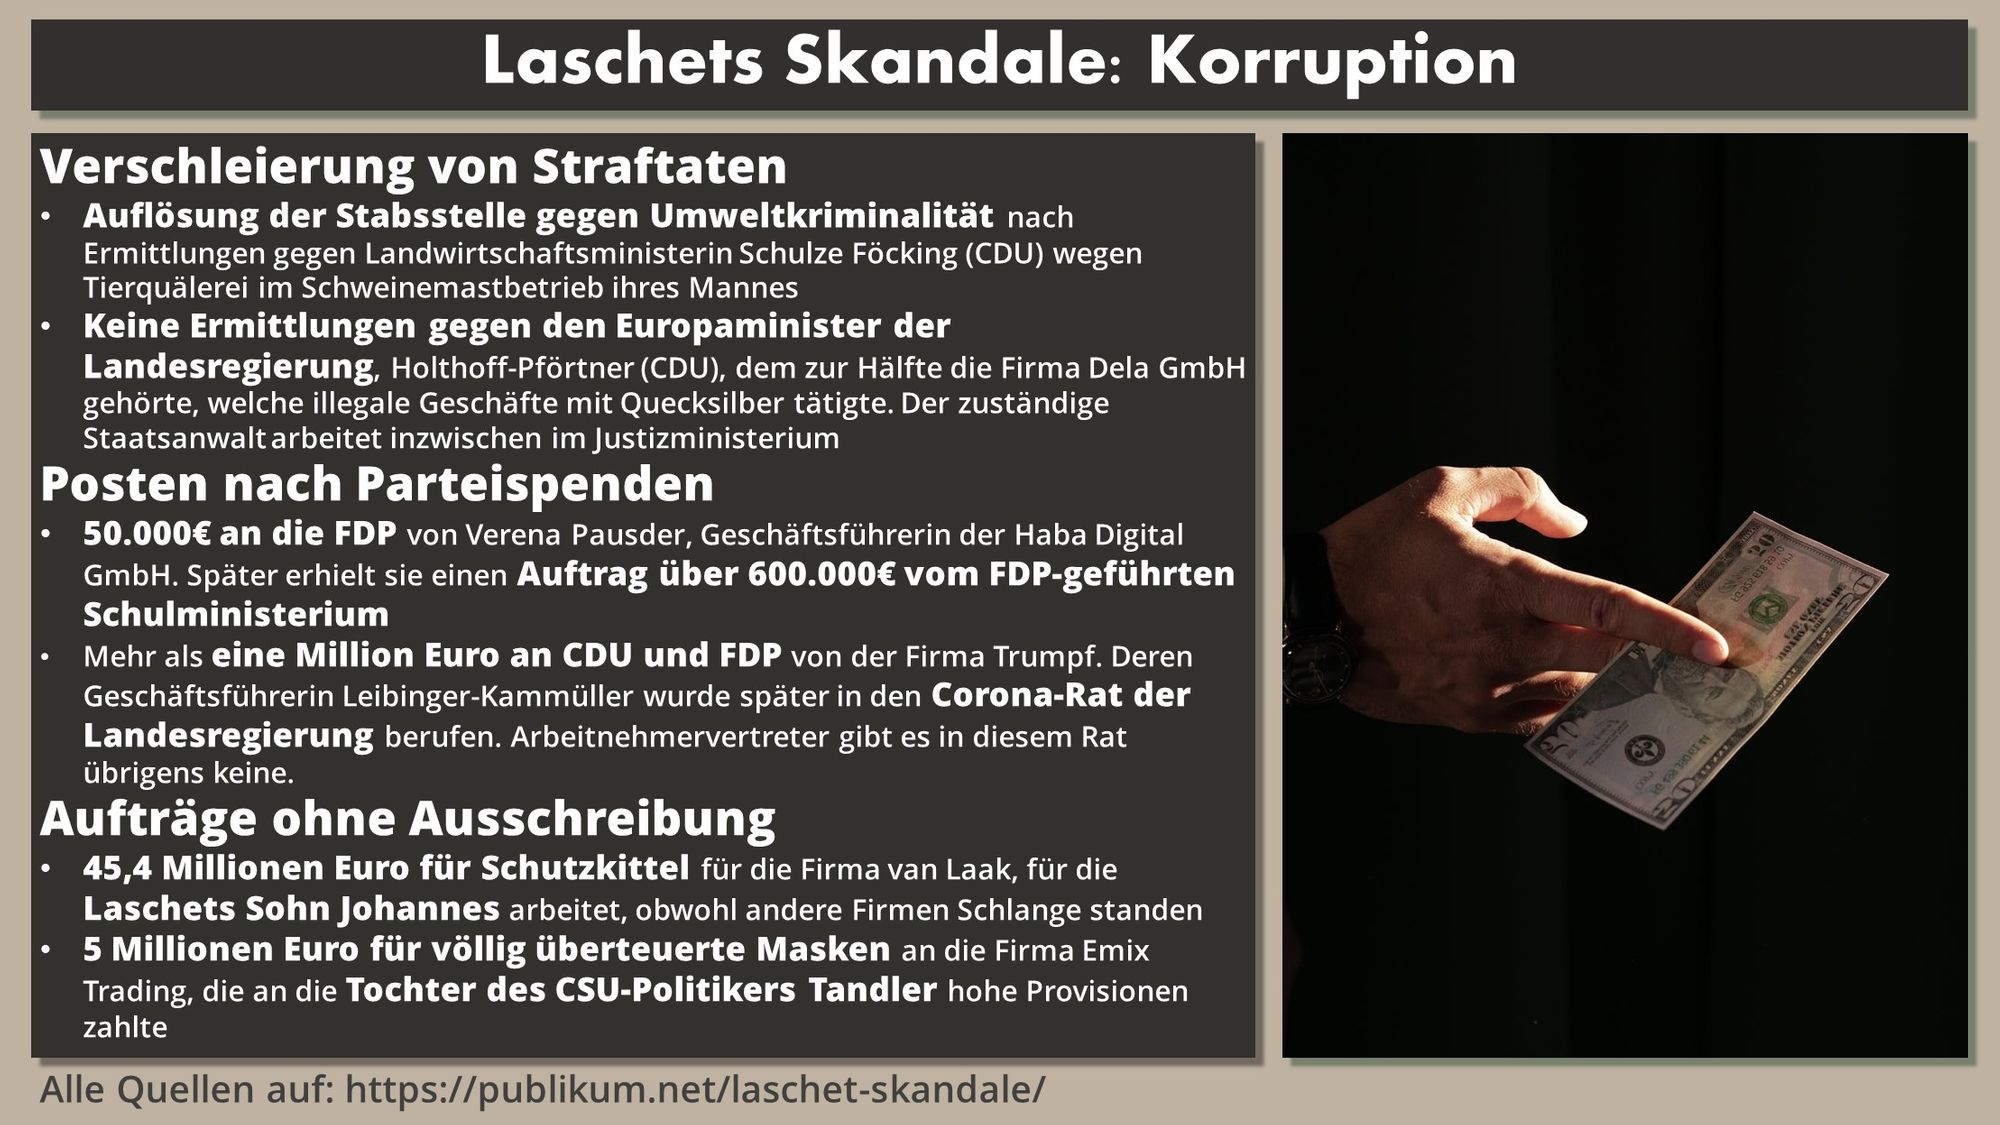 Laschet Skandale Korruption